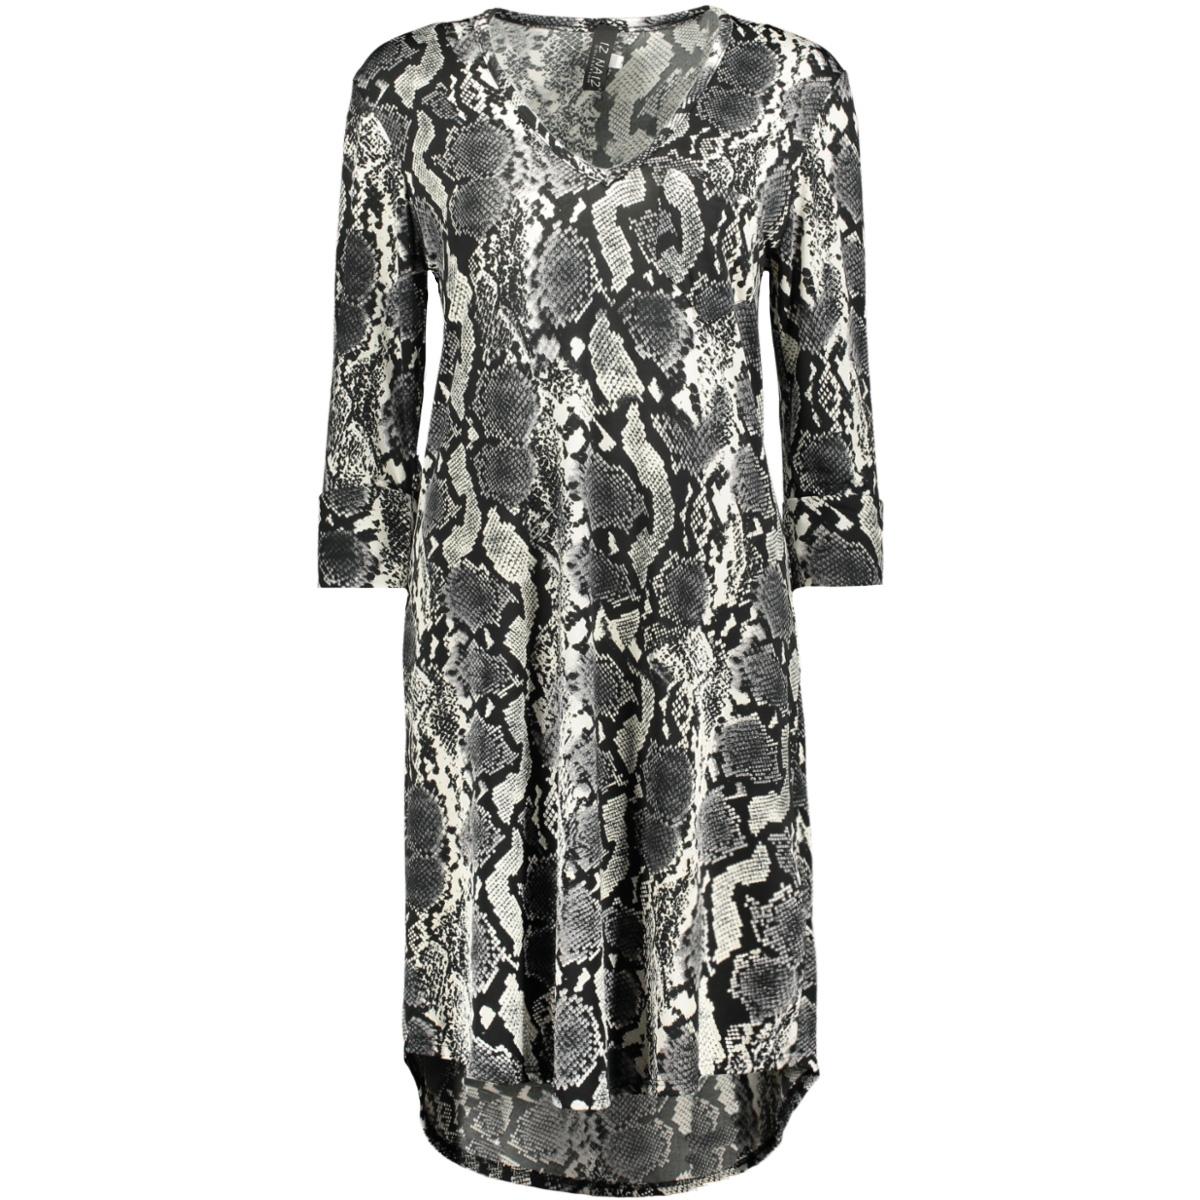 jurk 3515 iz naiz jurk snake grey